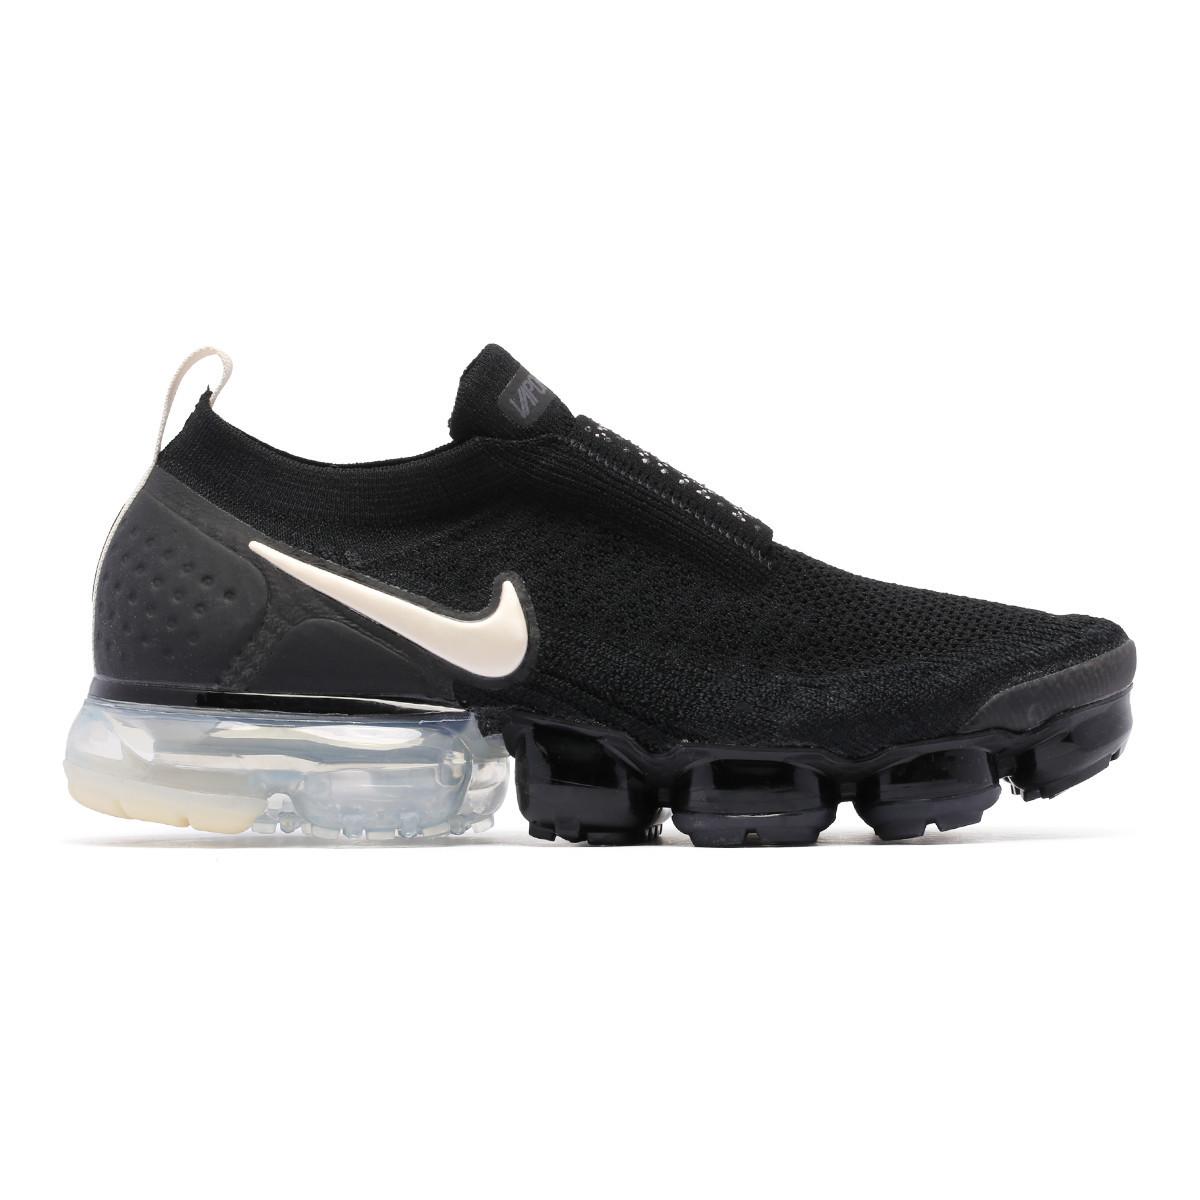 6af1e165f5017 Nike Air VaporMax Moc 2 (Black  Light Cream  and 43 similar items